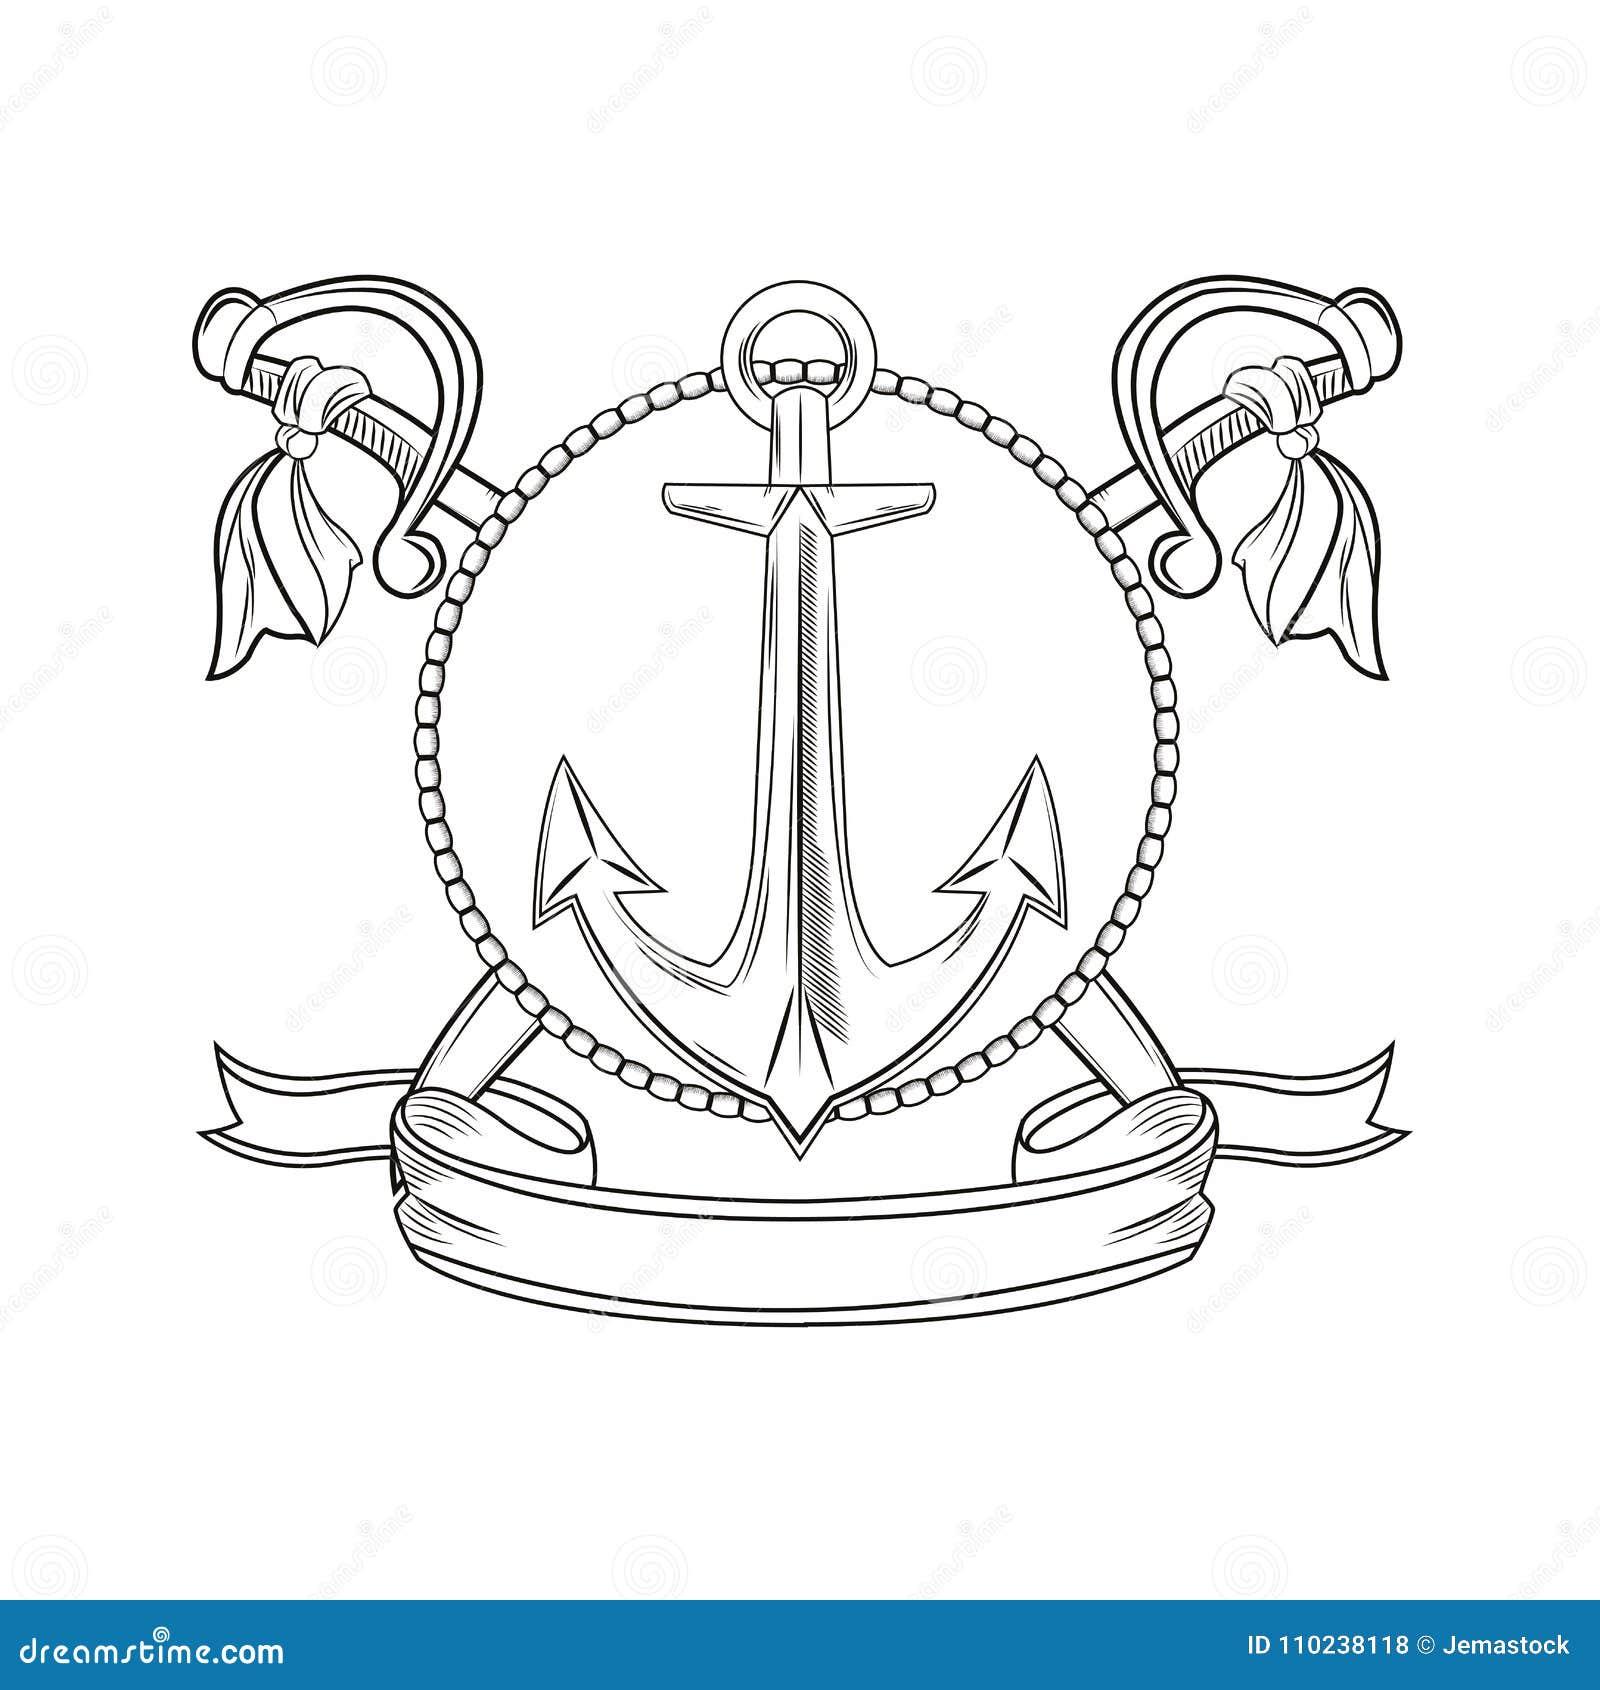 b29326ebc Anchor sword ribbon seal stamp cartoon pirate tattoo marine nautical icon.  Black white isolated design. Vector illustration